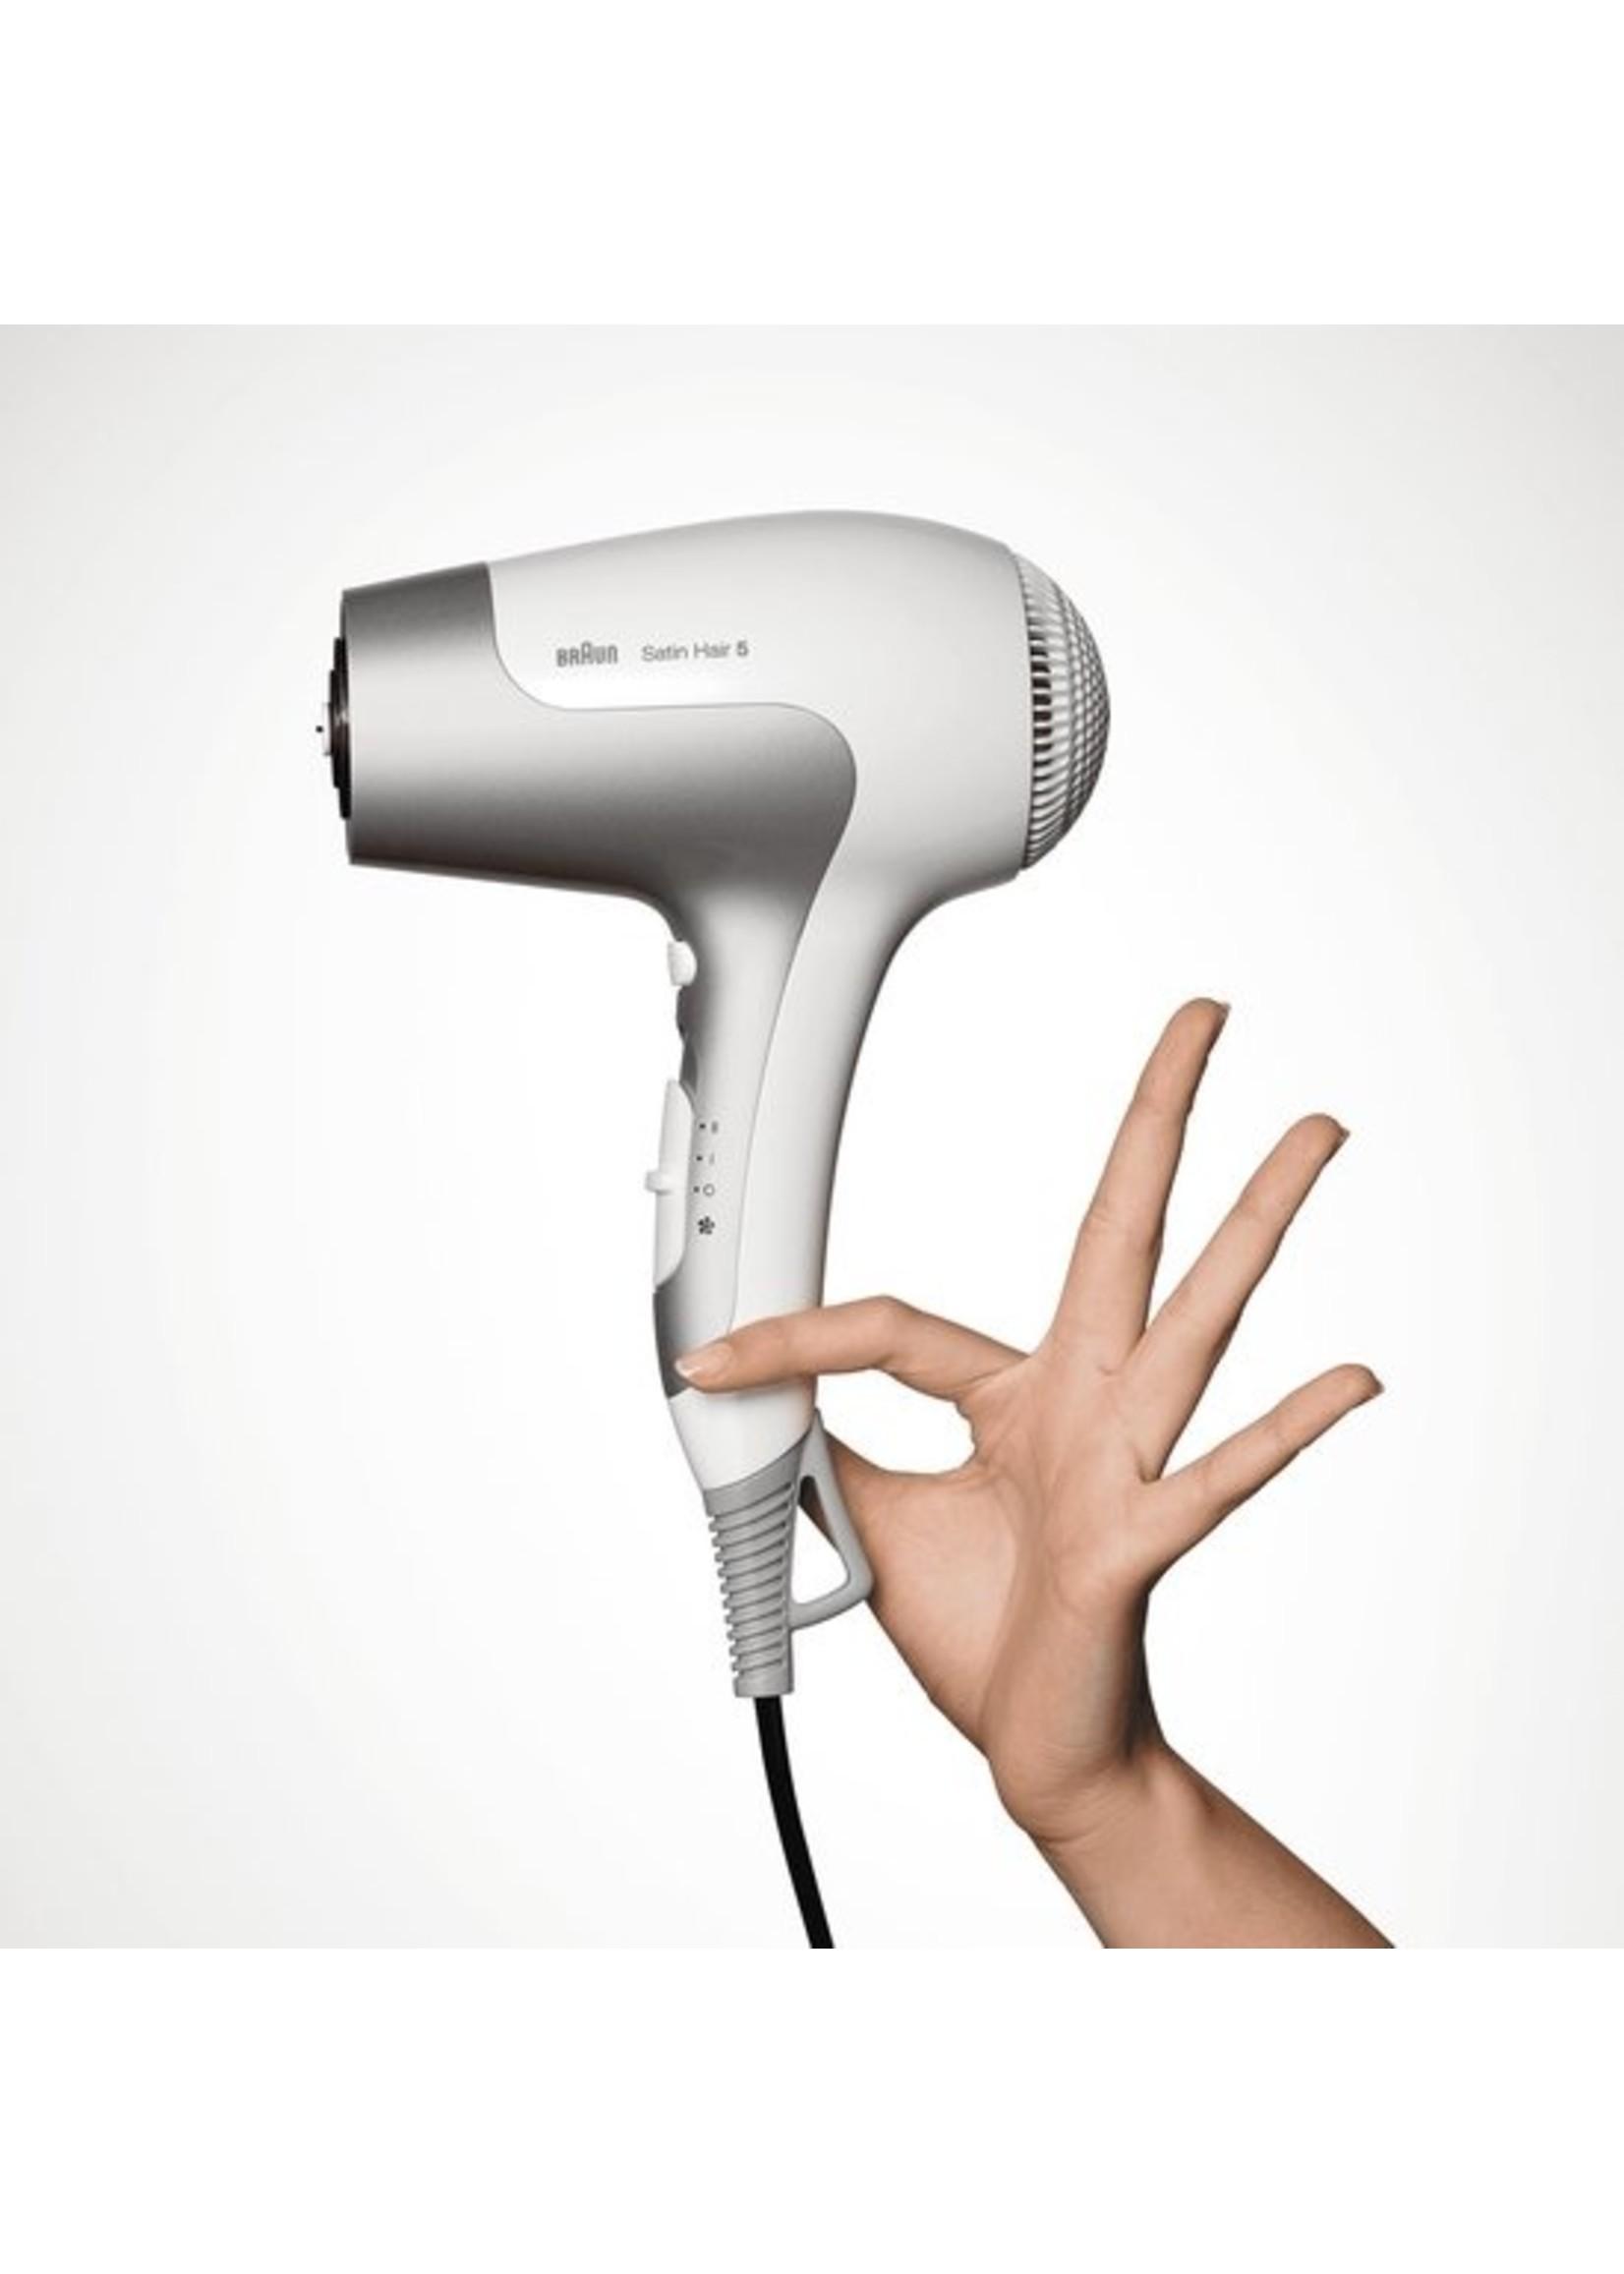 Braun Braun Satin Hair 5 HD580 Power Perfection - Föhn koopjeshoek